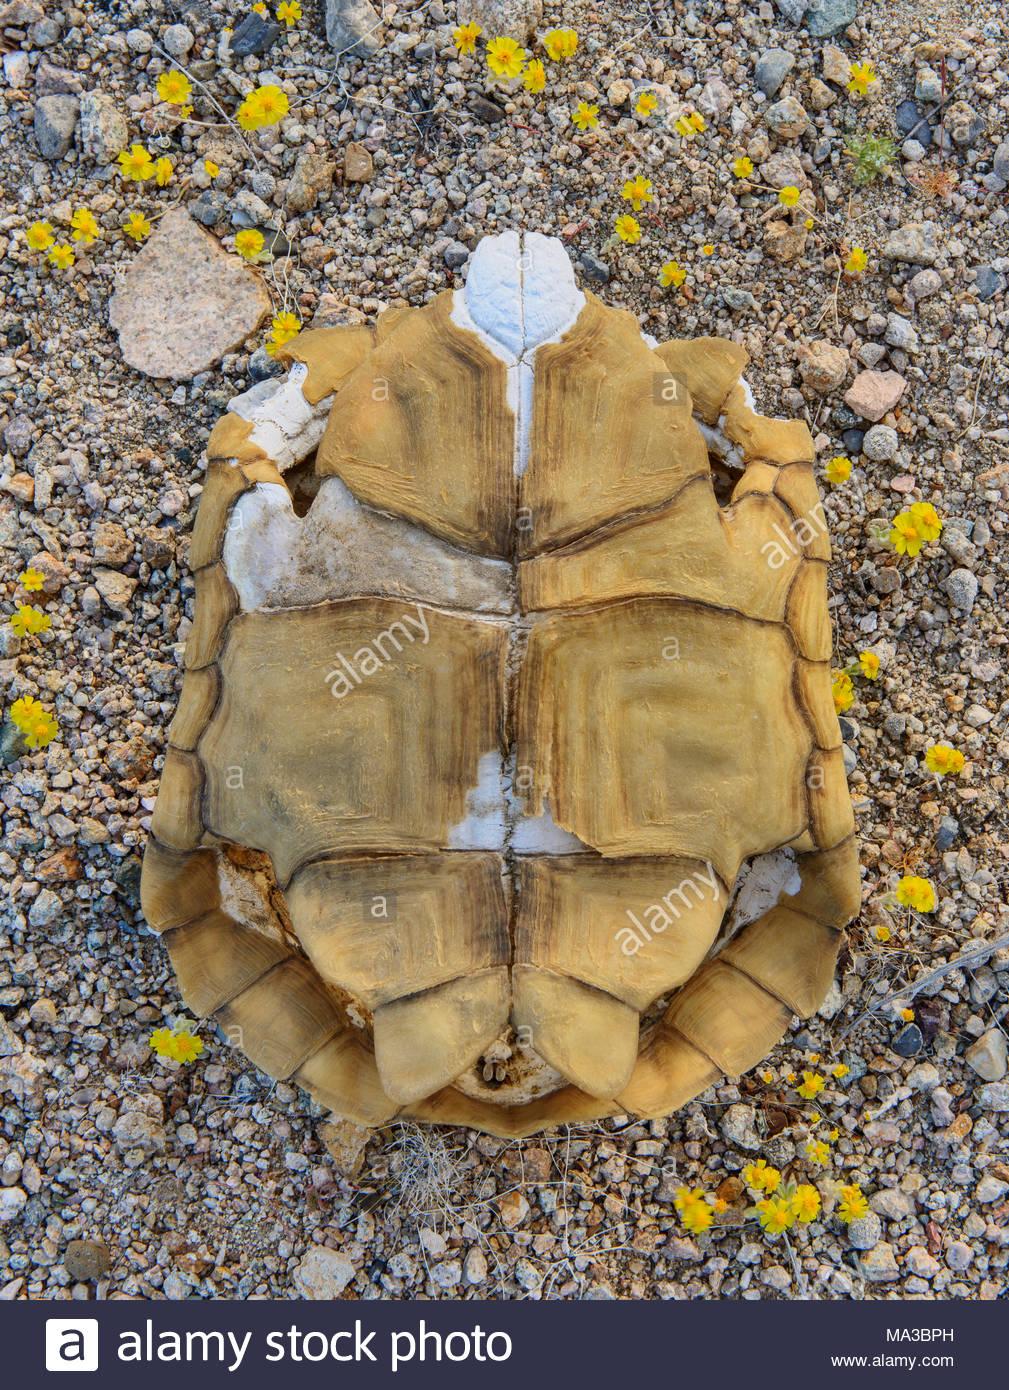 Caparazón de tortuga del desierto de Mojave National Preserve, California Imagen De Stock